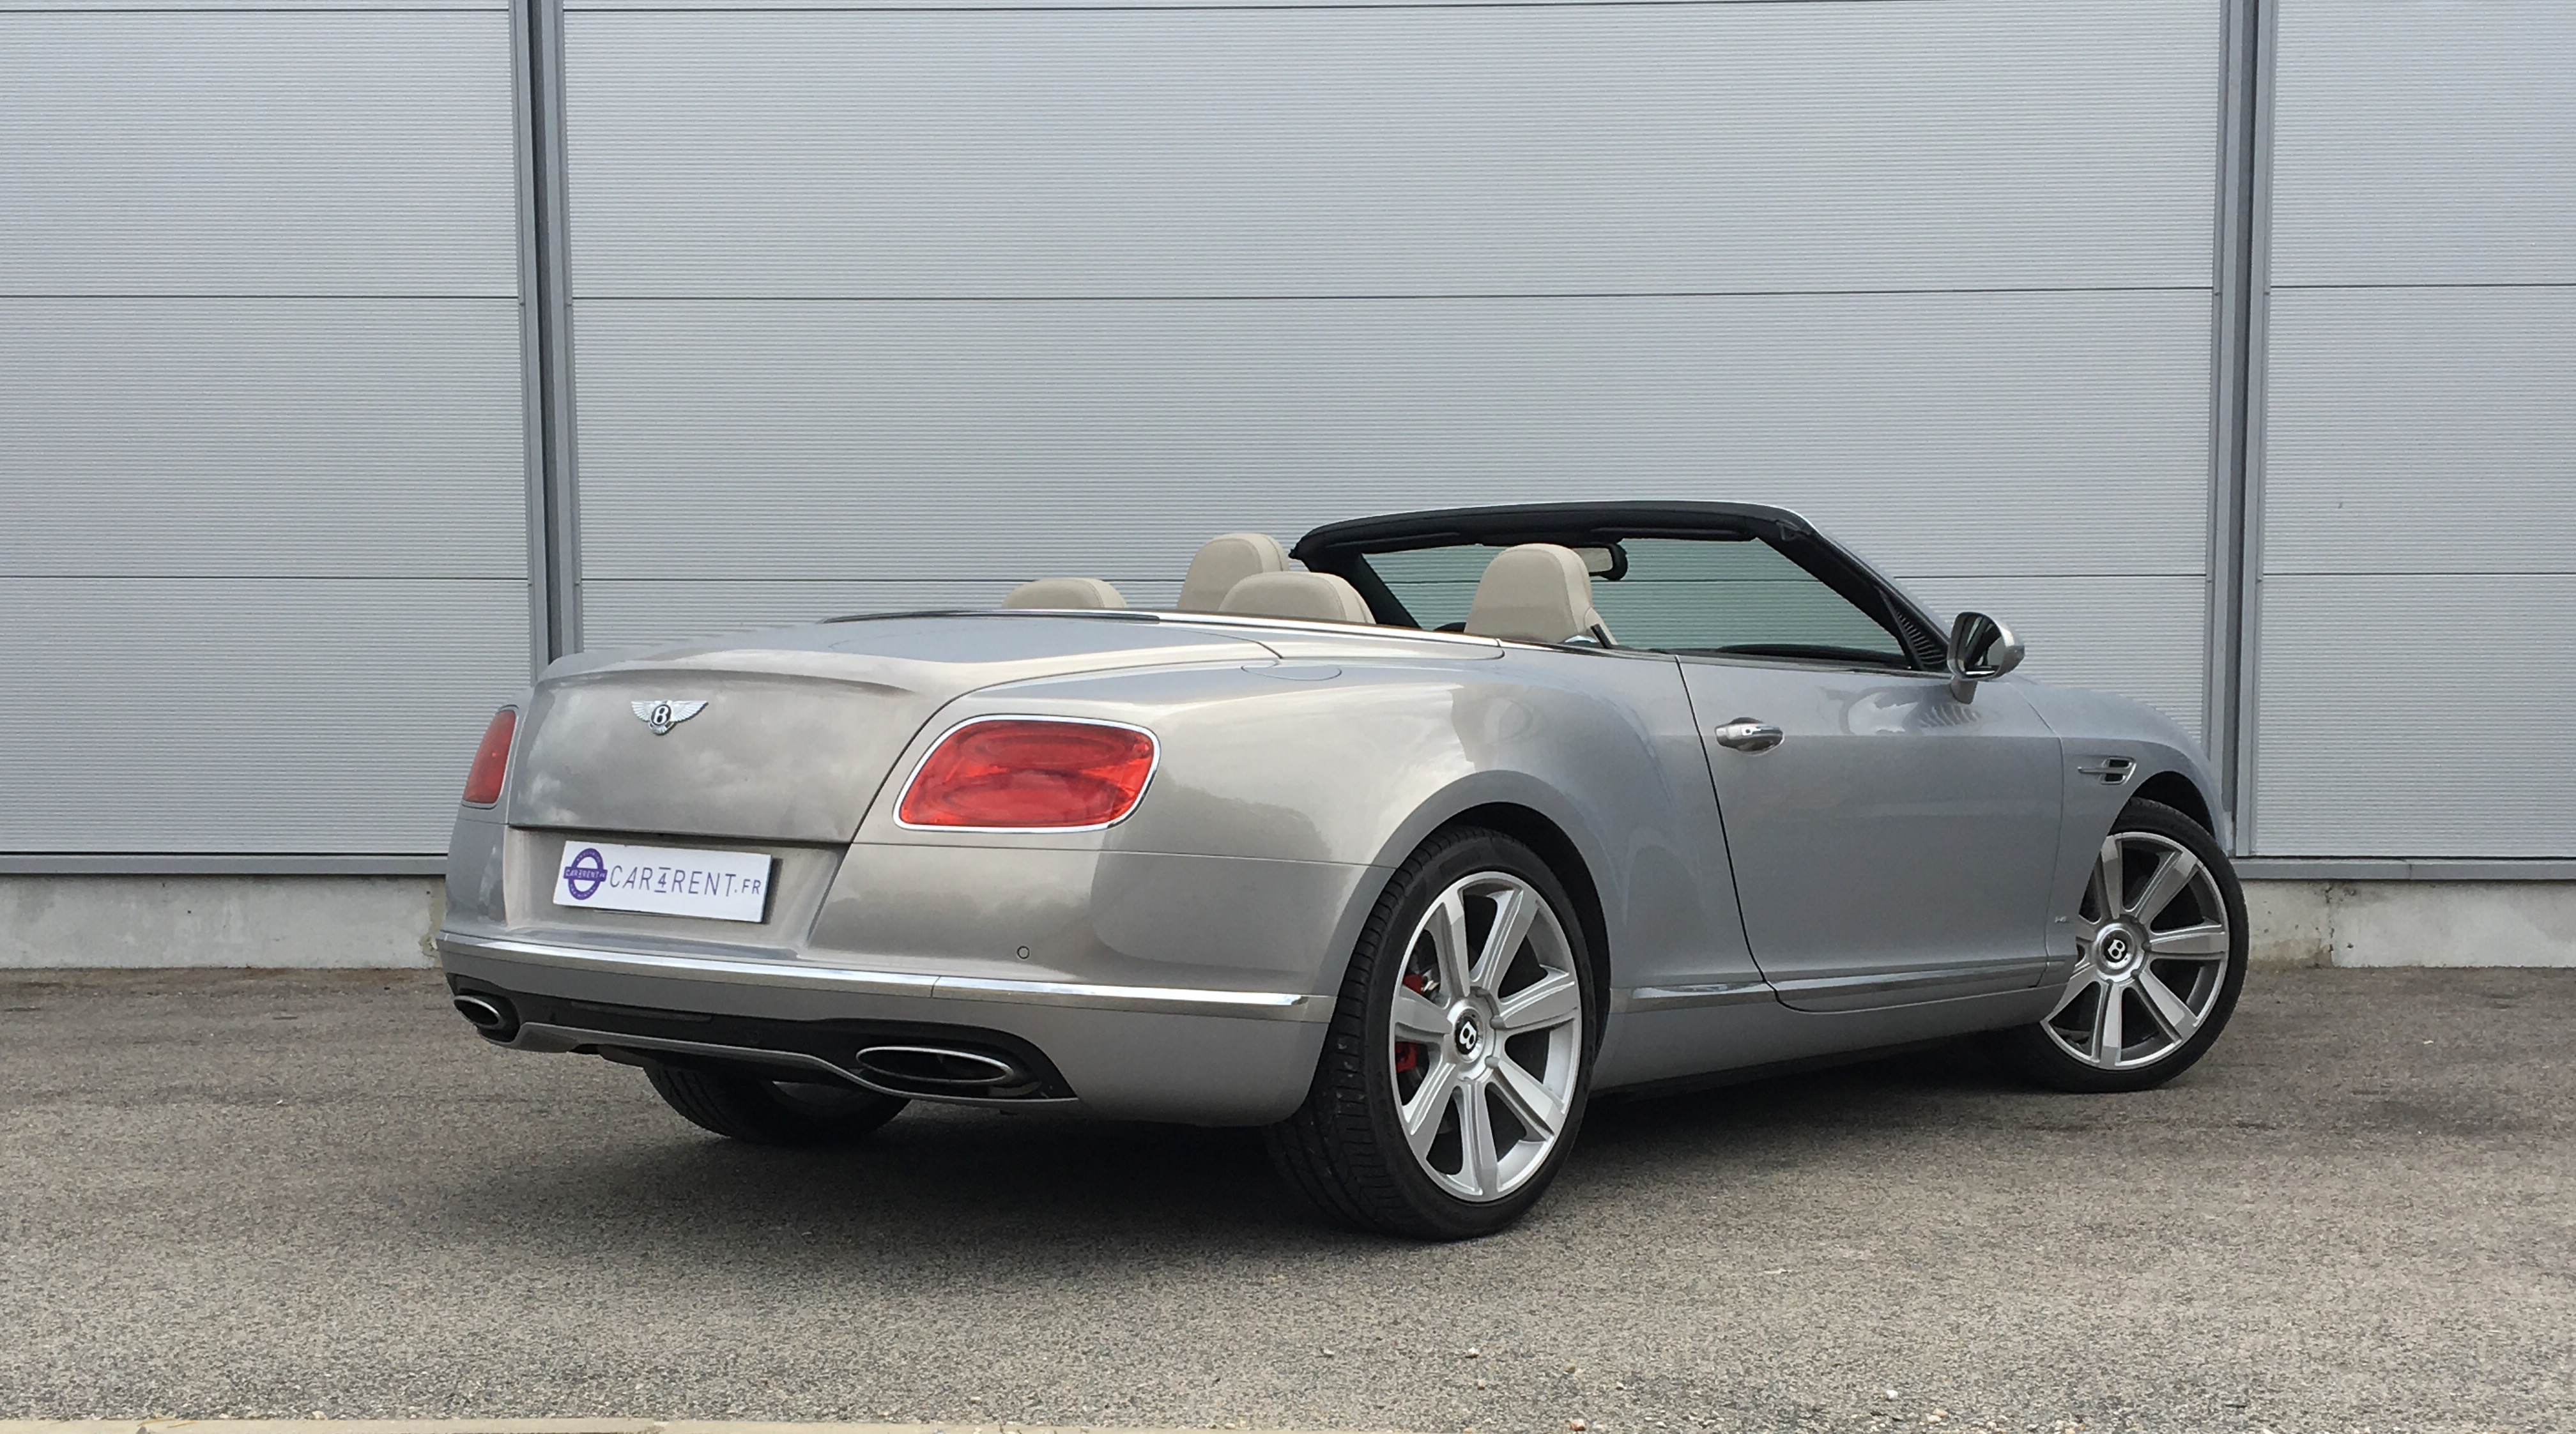 luxury sport rental new spur aaa for bentley rent car hire flying